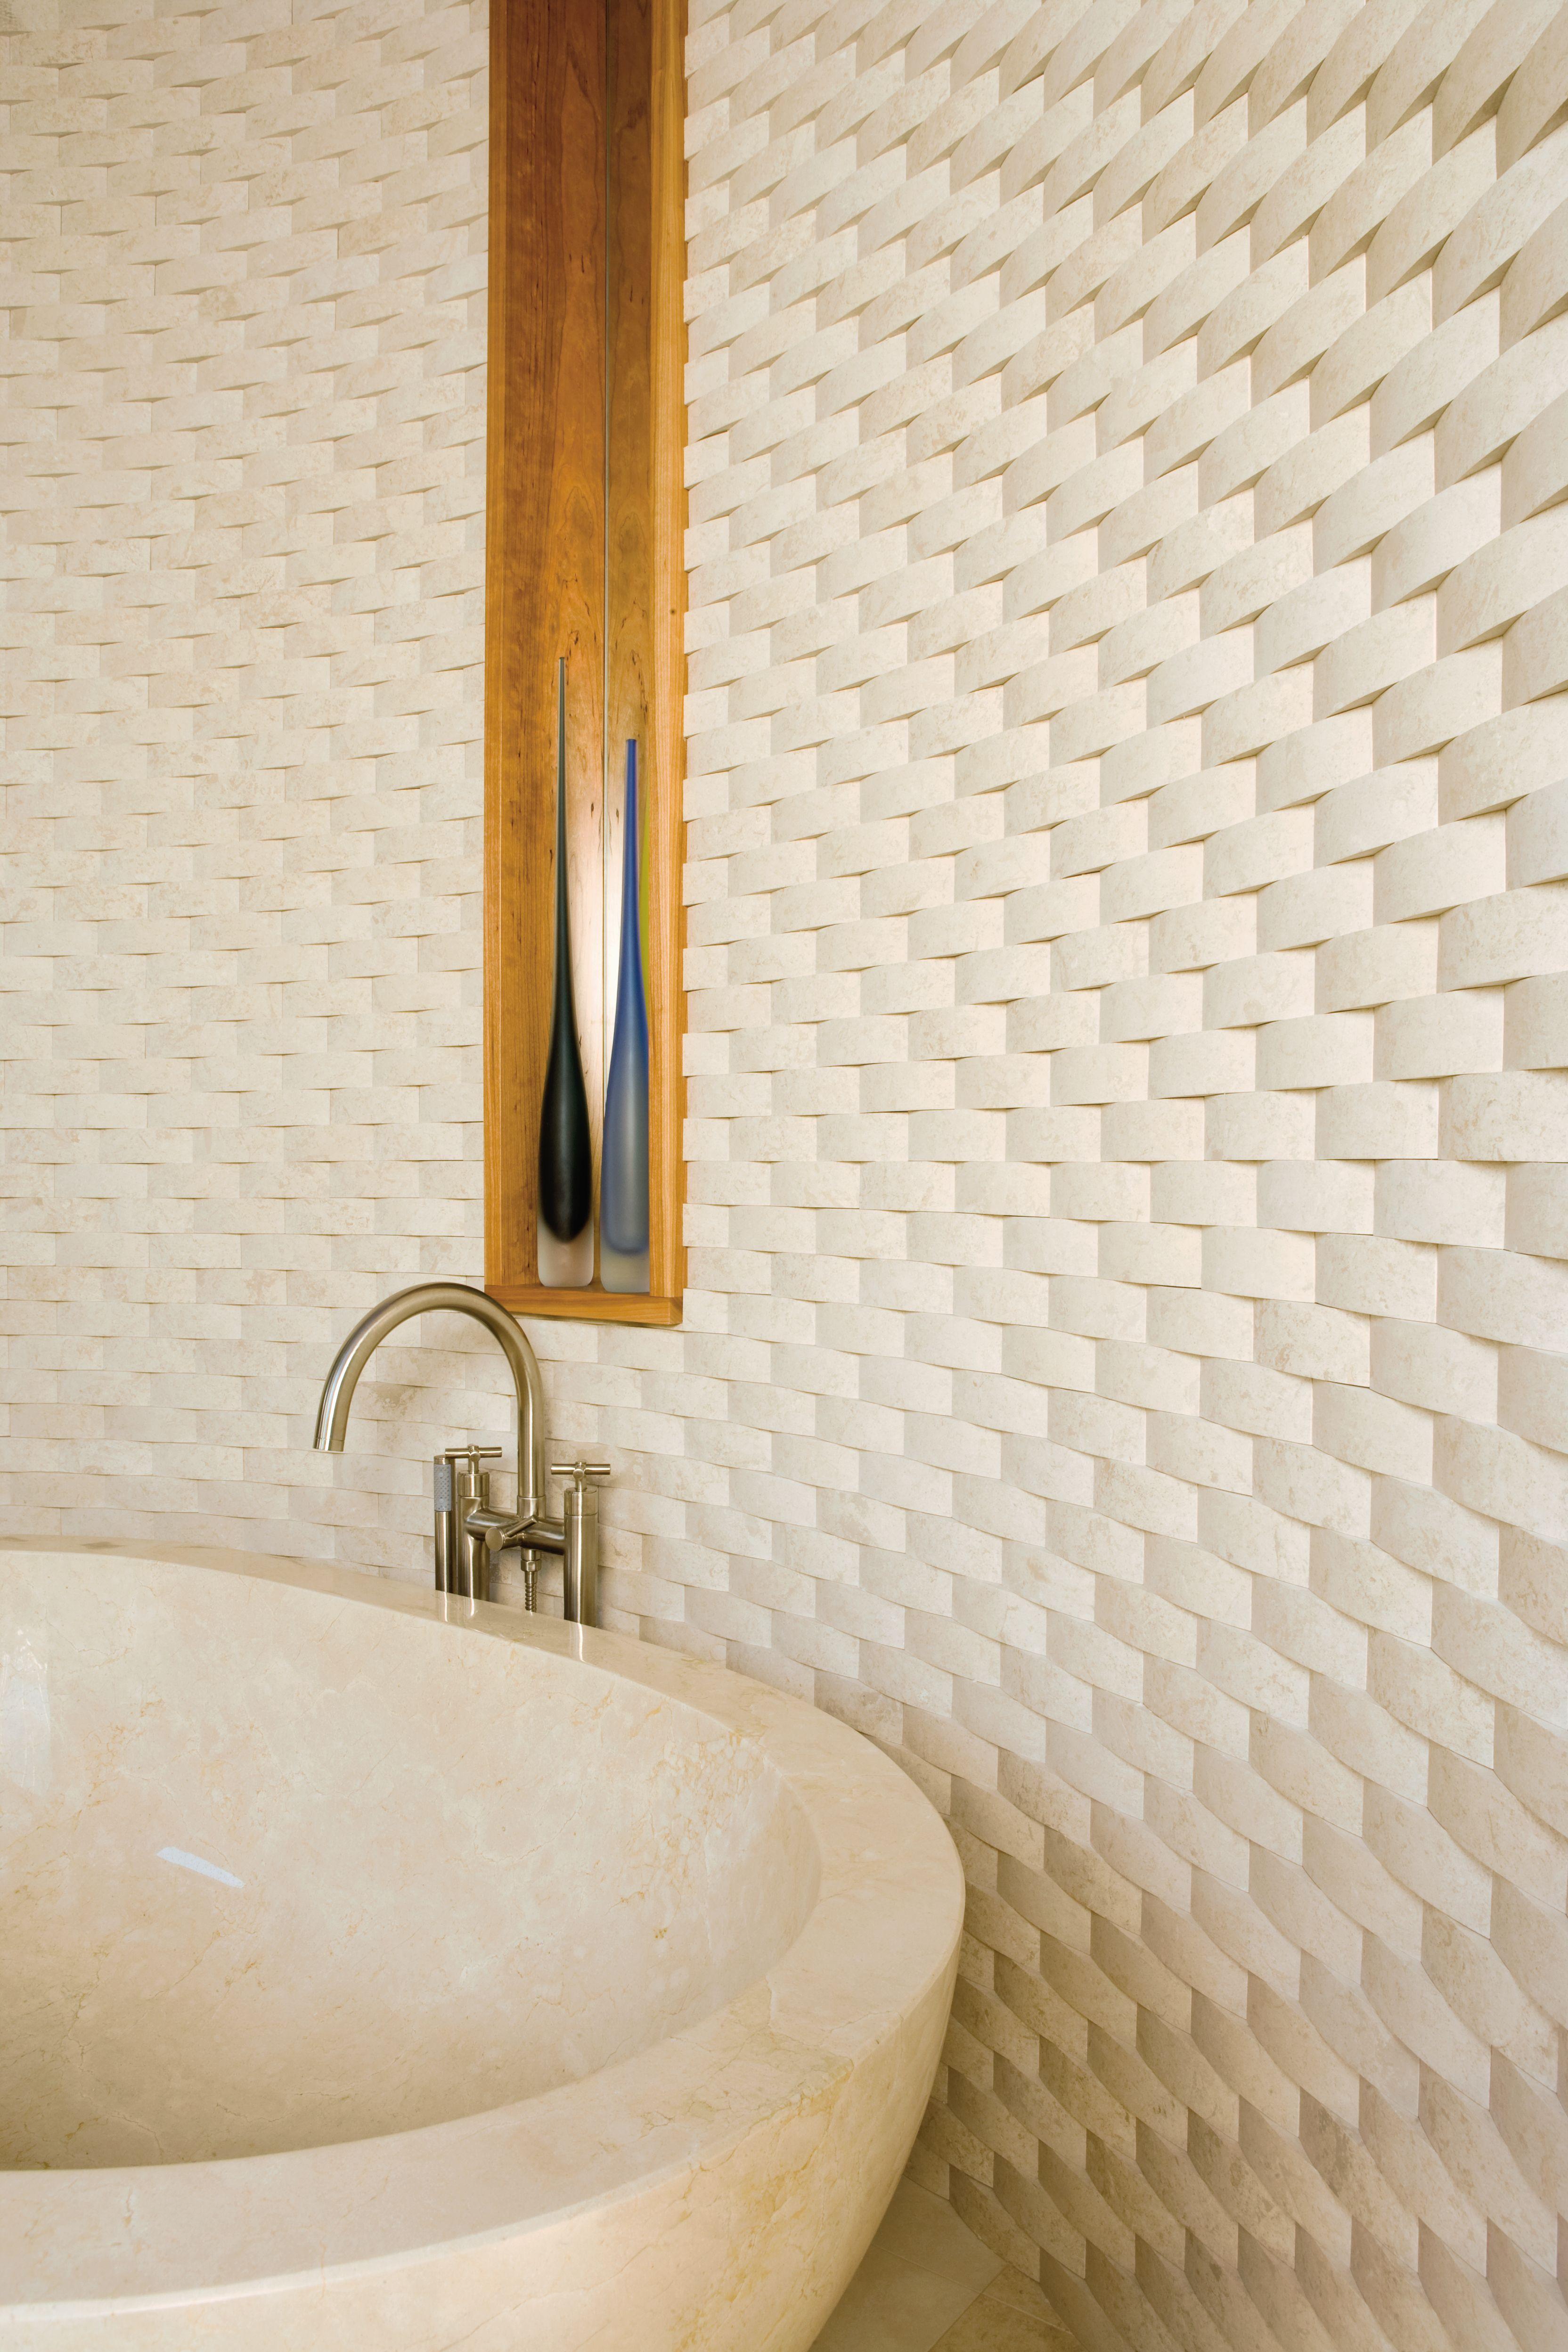 Ann Sacks St Petersburg 2 X 6 Basketweave Limestone Field In Honed Finish Designer Hammer Schmidt Inc